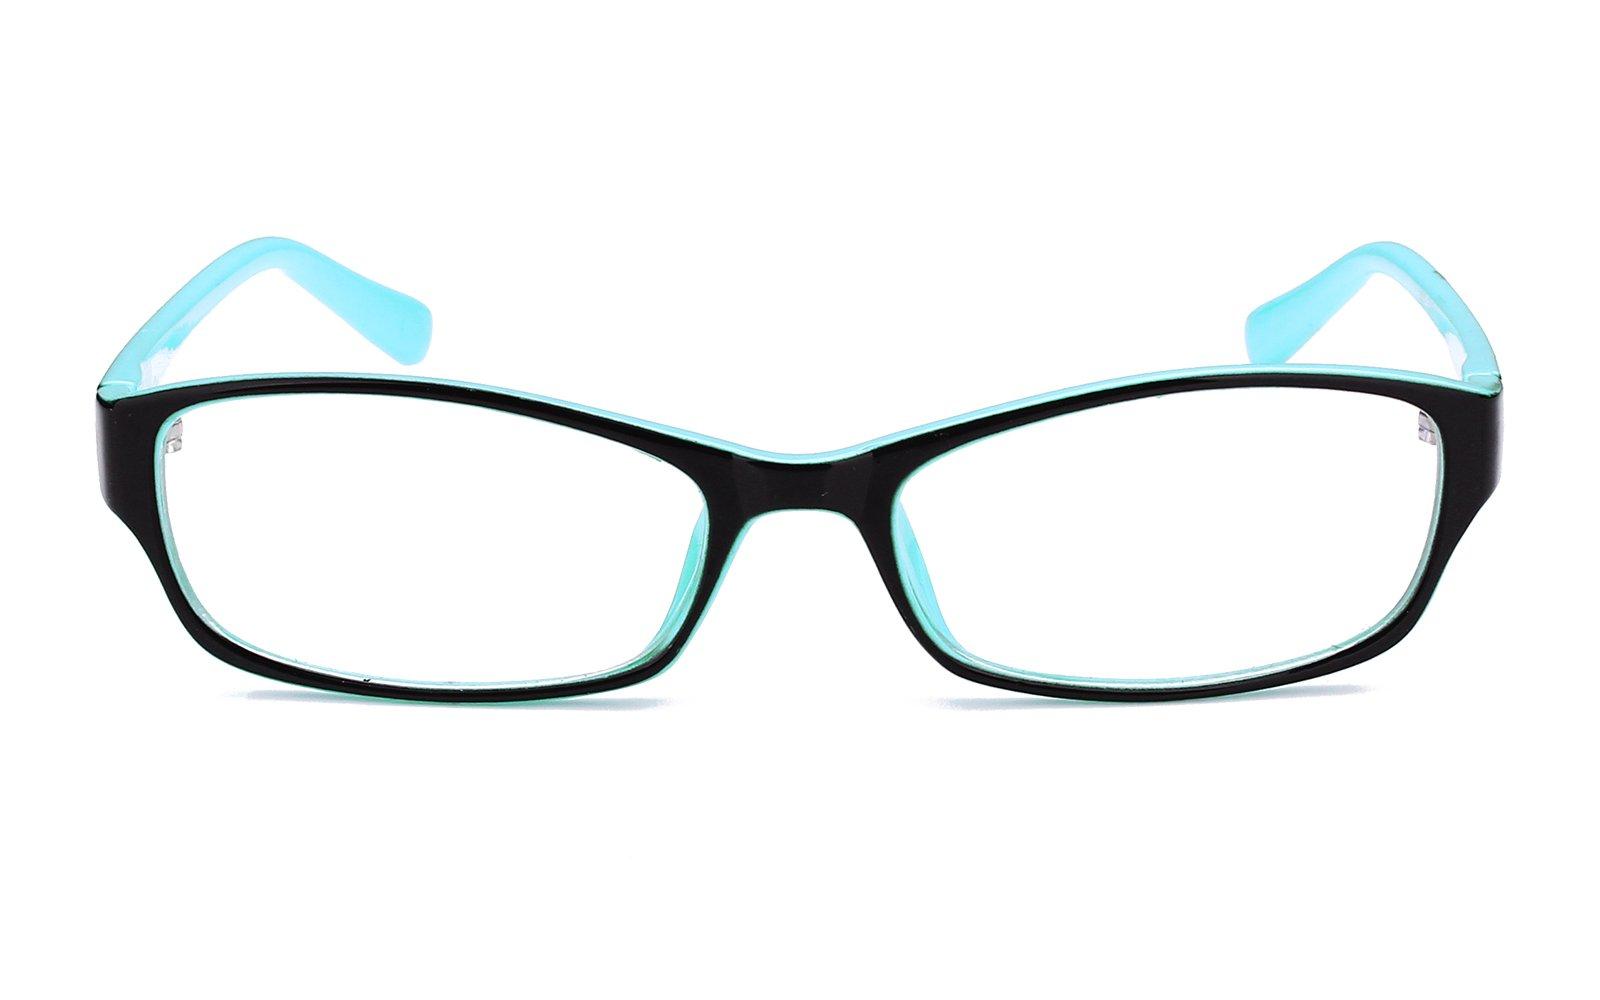 6c520cc5865 Agstum Kids Classic Rectangle Optical Frame Girls Boys Glasses Clear Lens  (Black   Blue)   Departments   Clothing